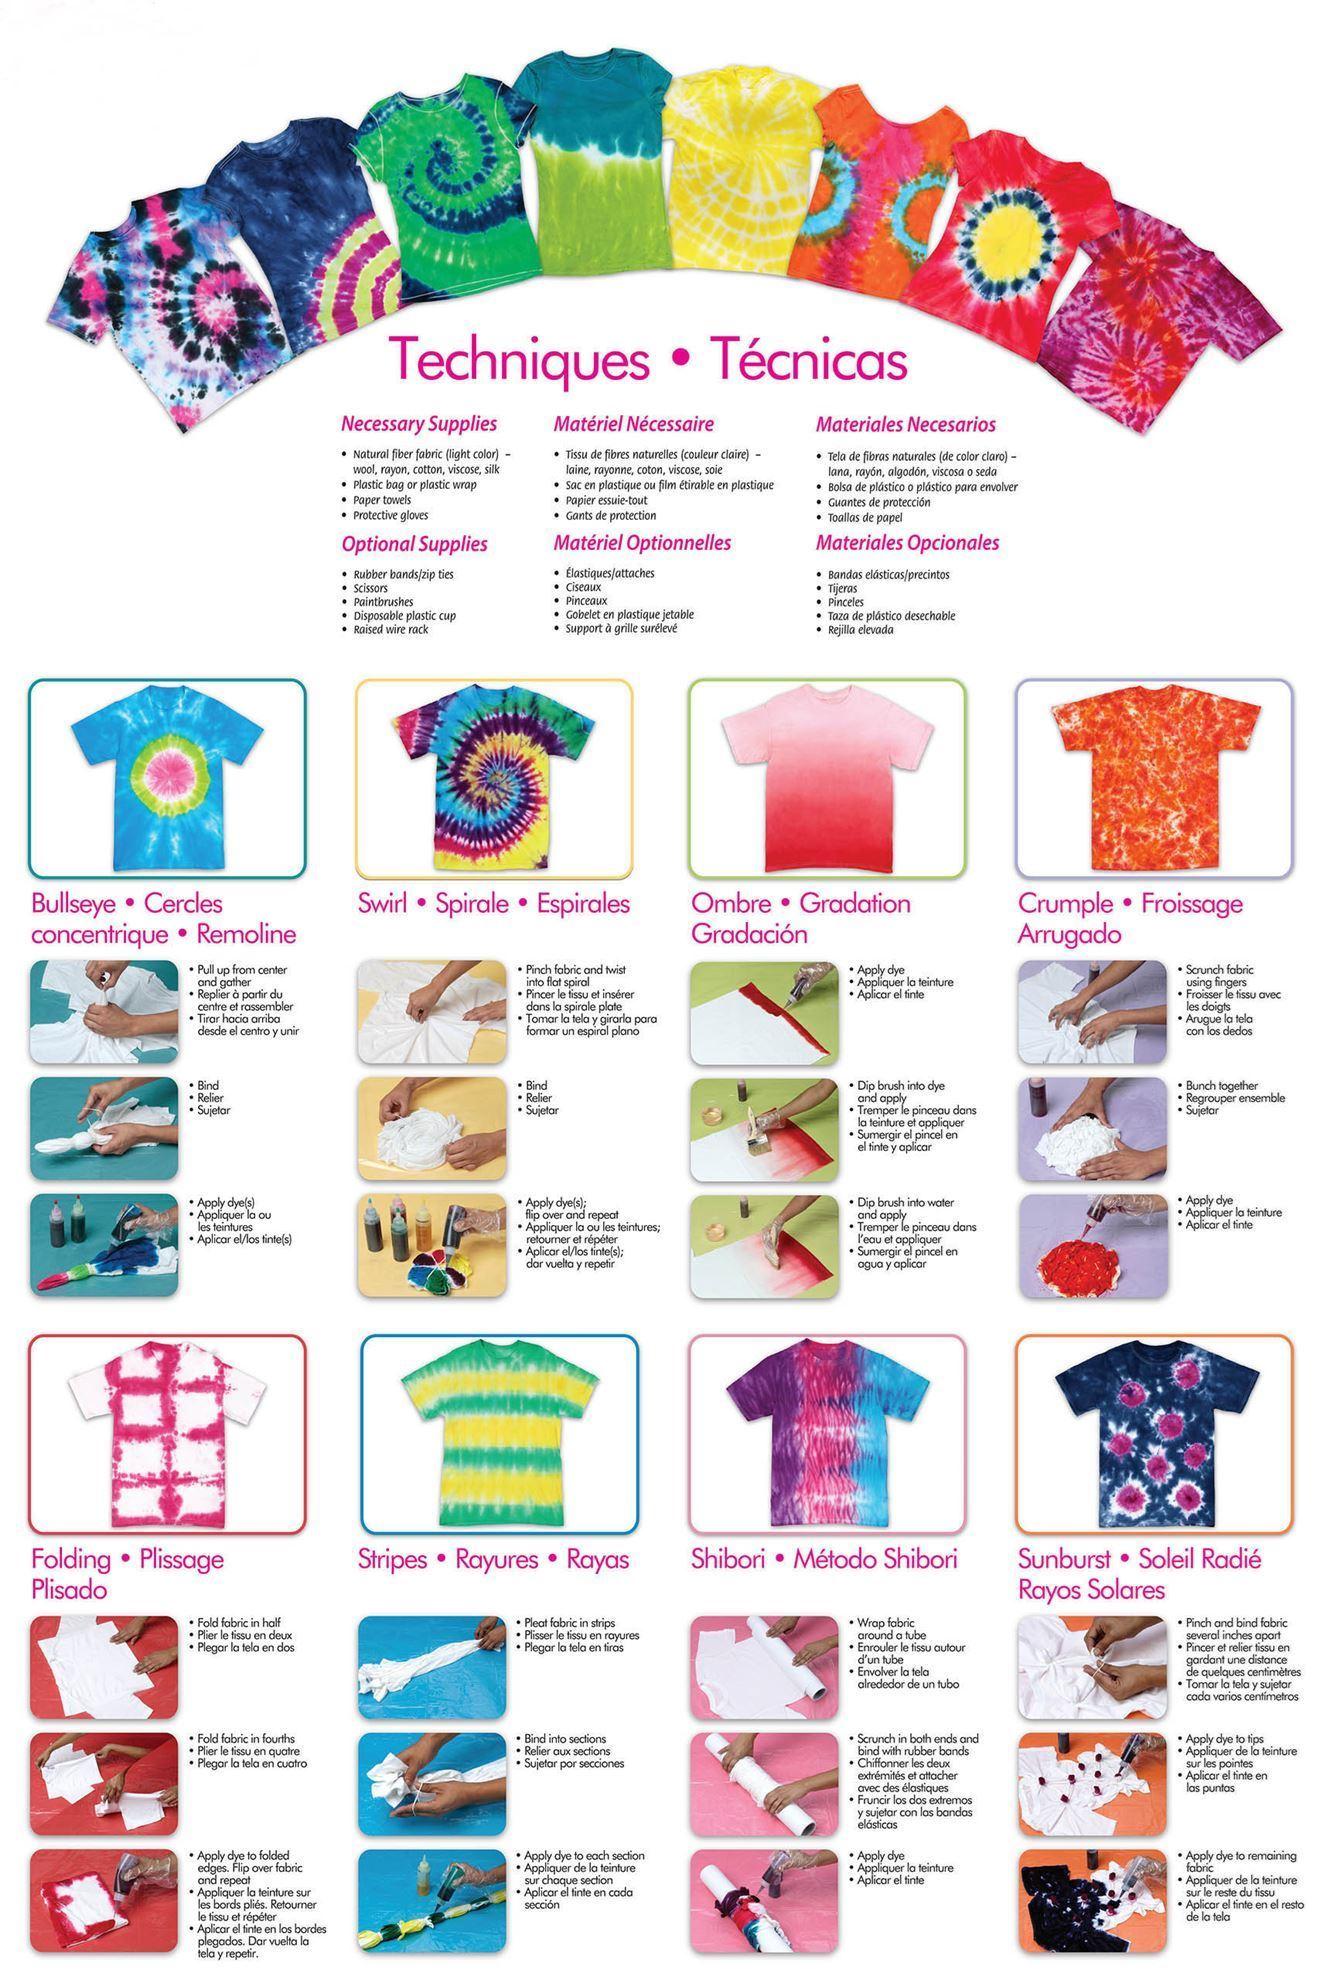 Bright 3-Color Tie-Dye Kit Instructions